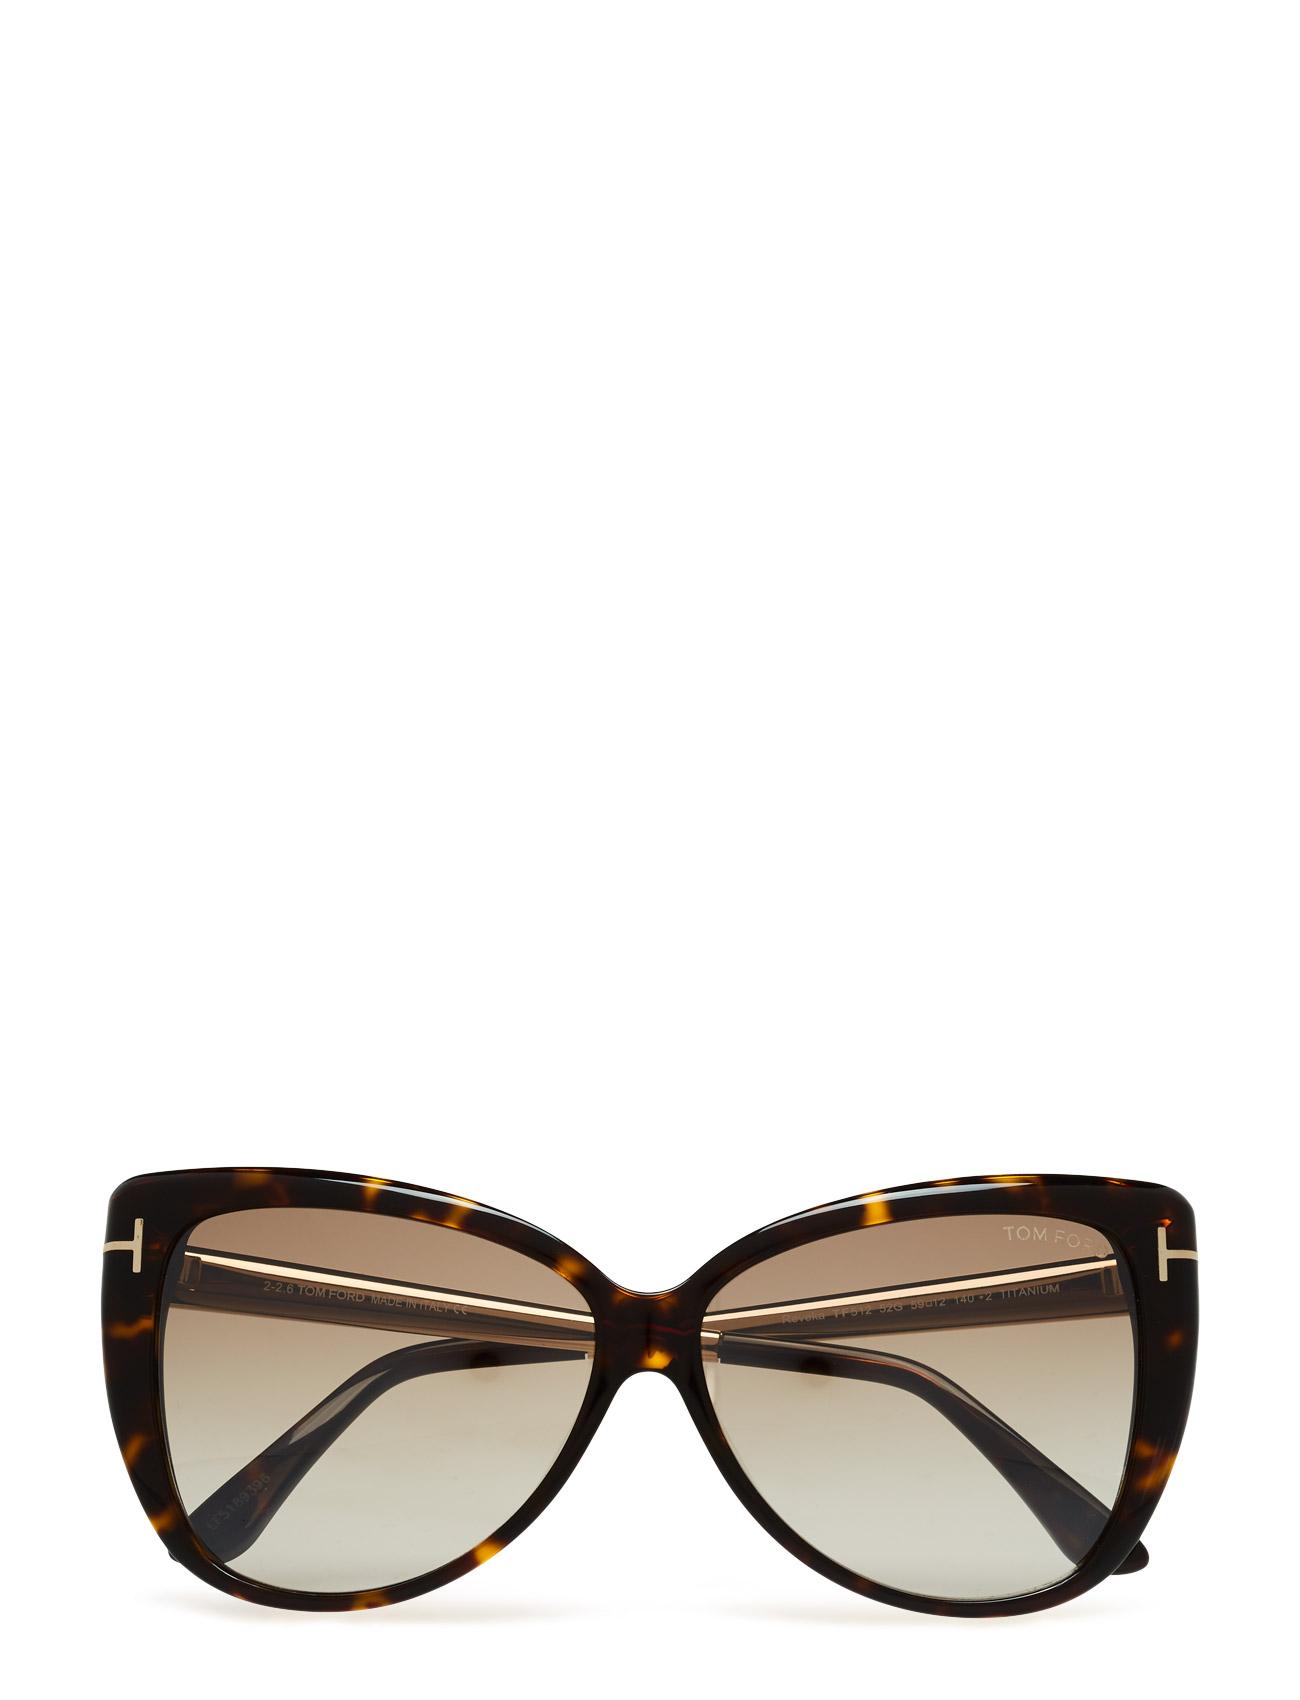 Tom Ford Reveka Tom Ford Sunglasses Solbriller til Kvinder i